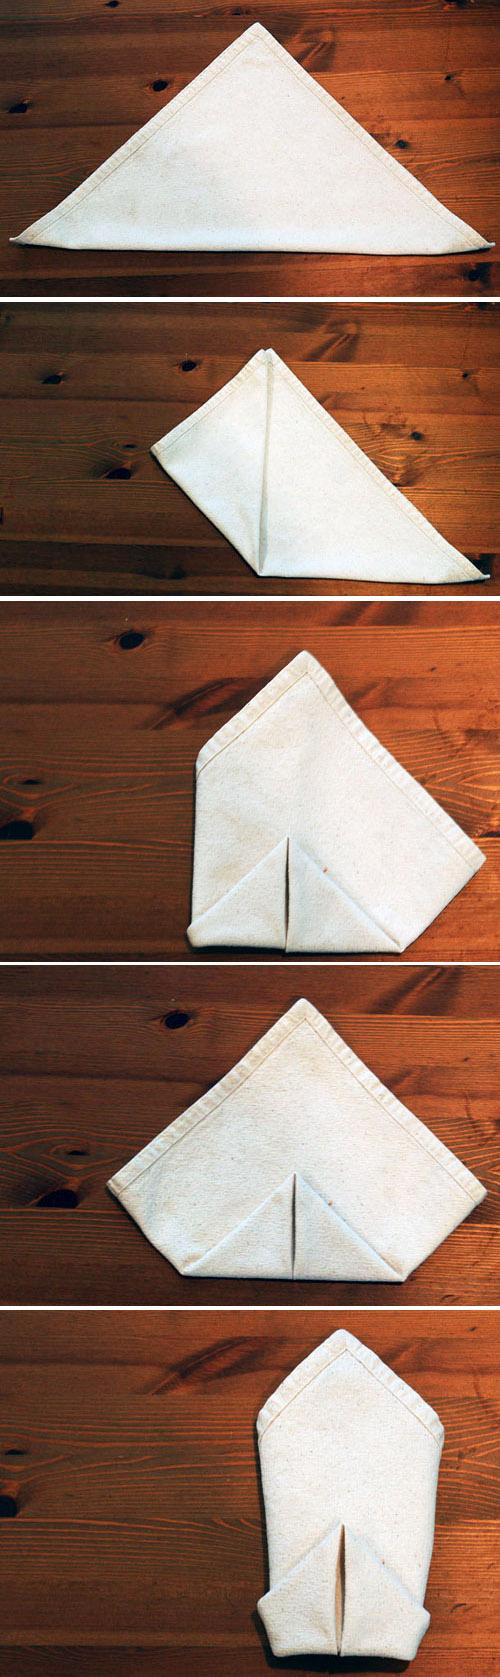 28 Creative NapkinFolding Techniques